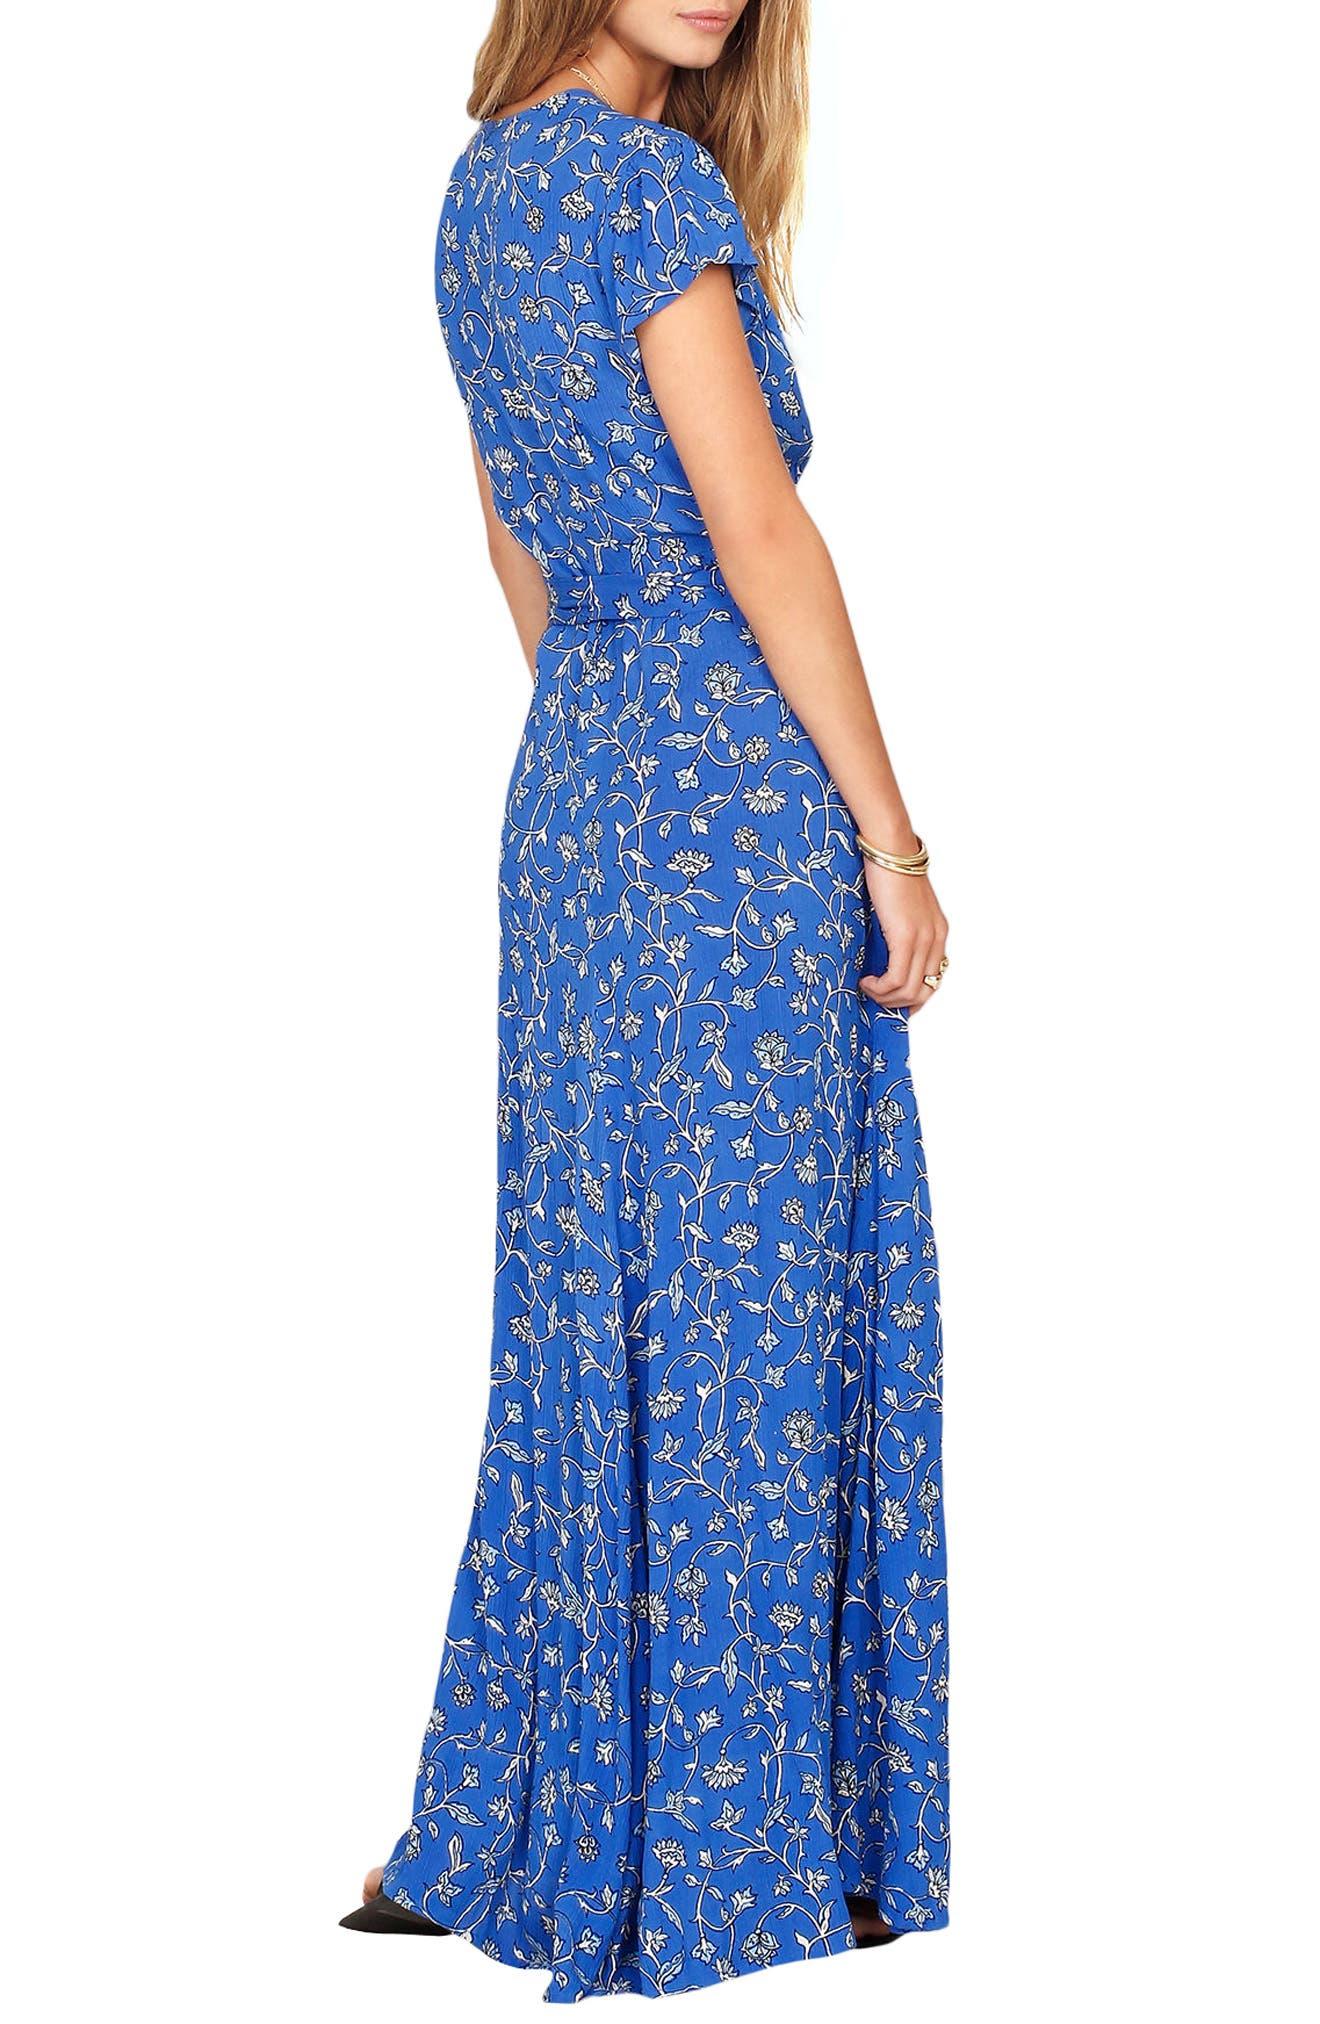 Summer Safari Wrap Dress,                             Alternate thumbnail 2, color,                             Blue Coast